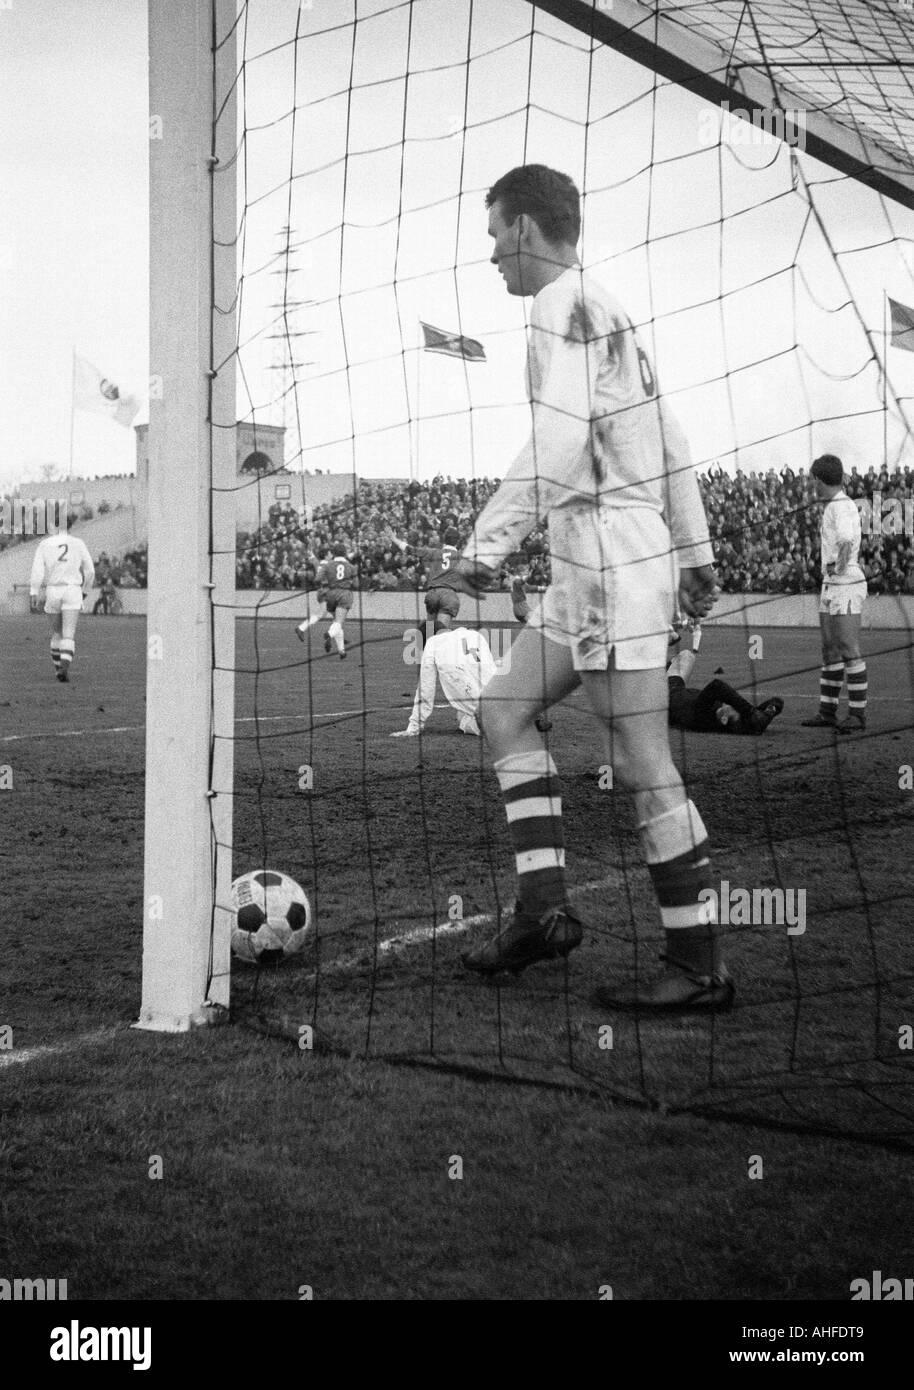 football, international UEFA youth class tournament 1965, semi-final, German Democratic Republic versus Czechoslovakia 2:1, Niederrhein Stadium in Oberhausen, scene of the match, GDR goal - Stock Image